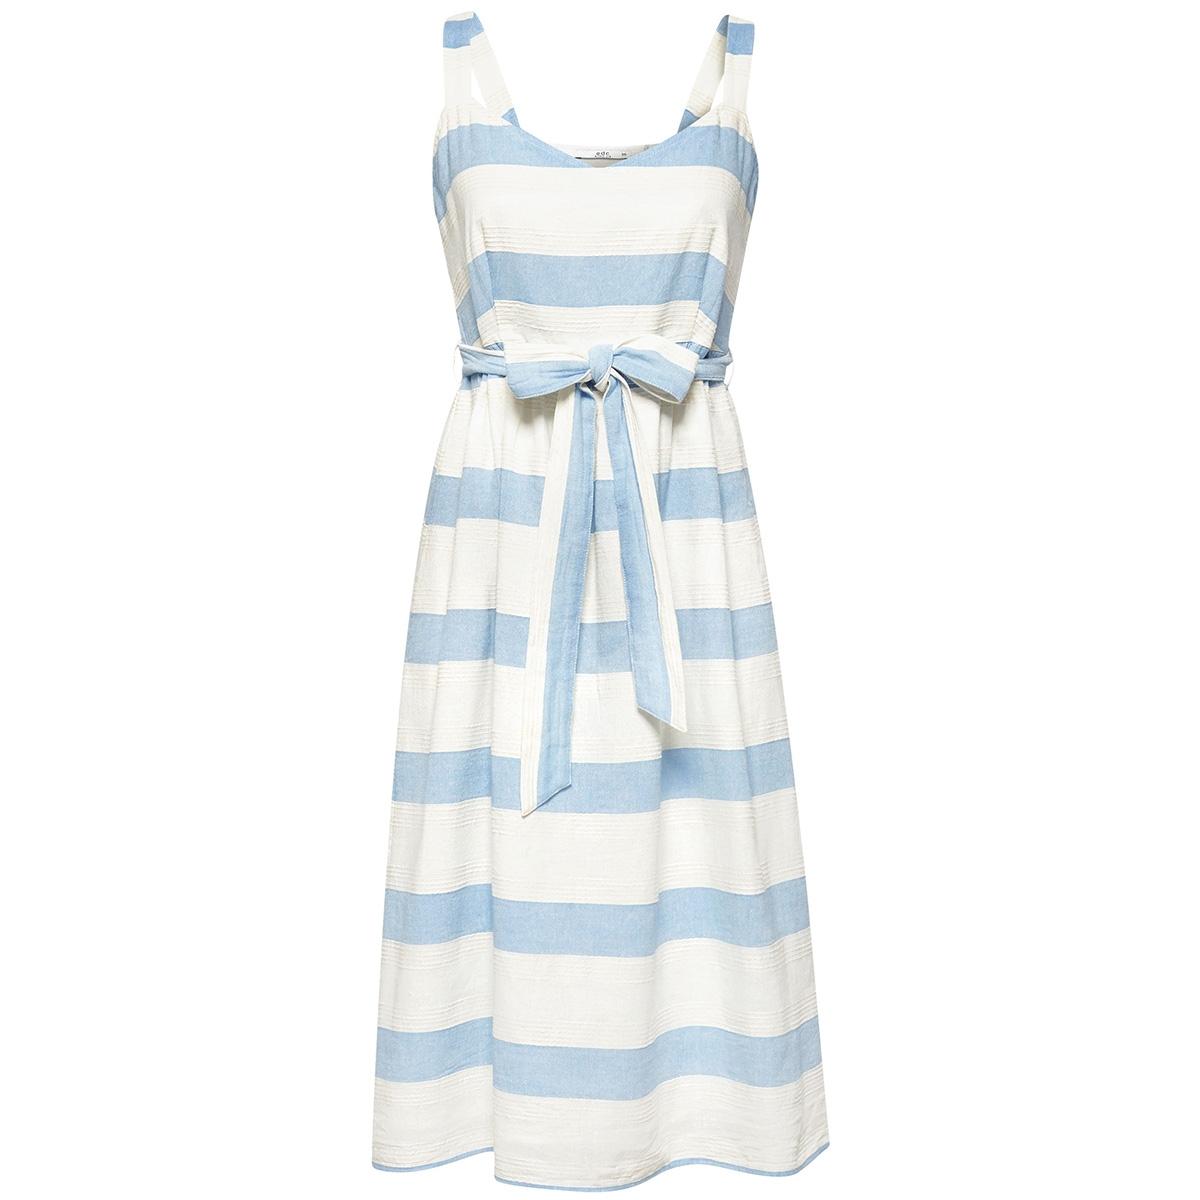 gestreepte jurk met schouderbanden 059cc1e017 edc jurk c110